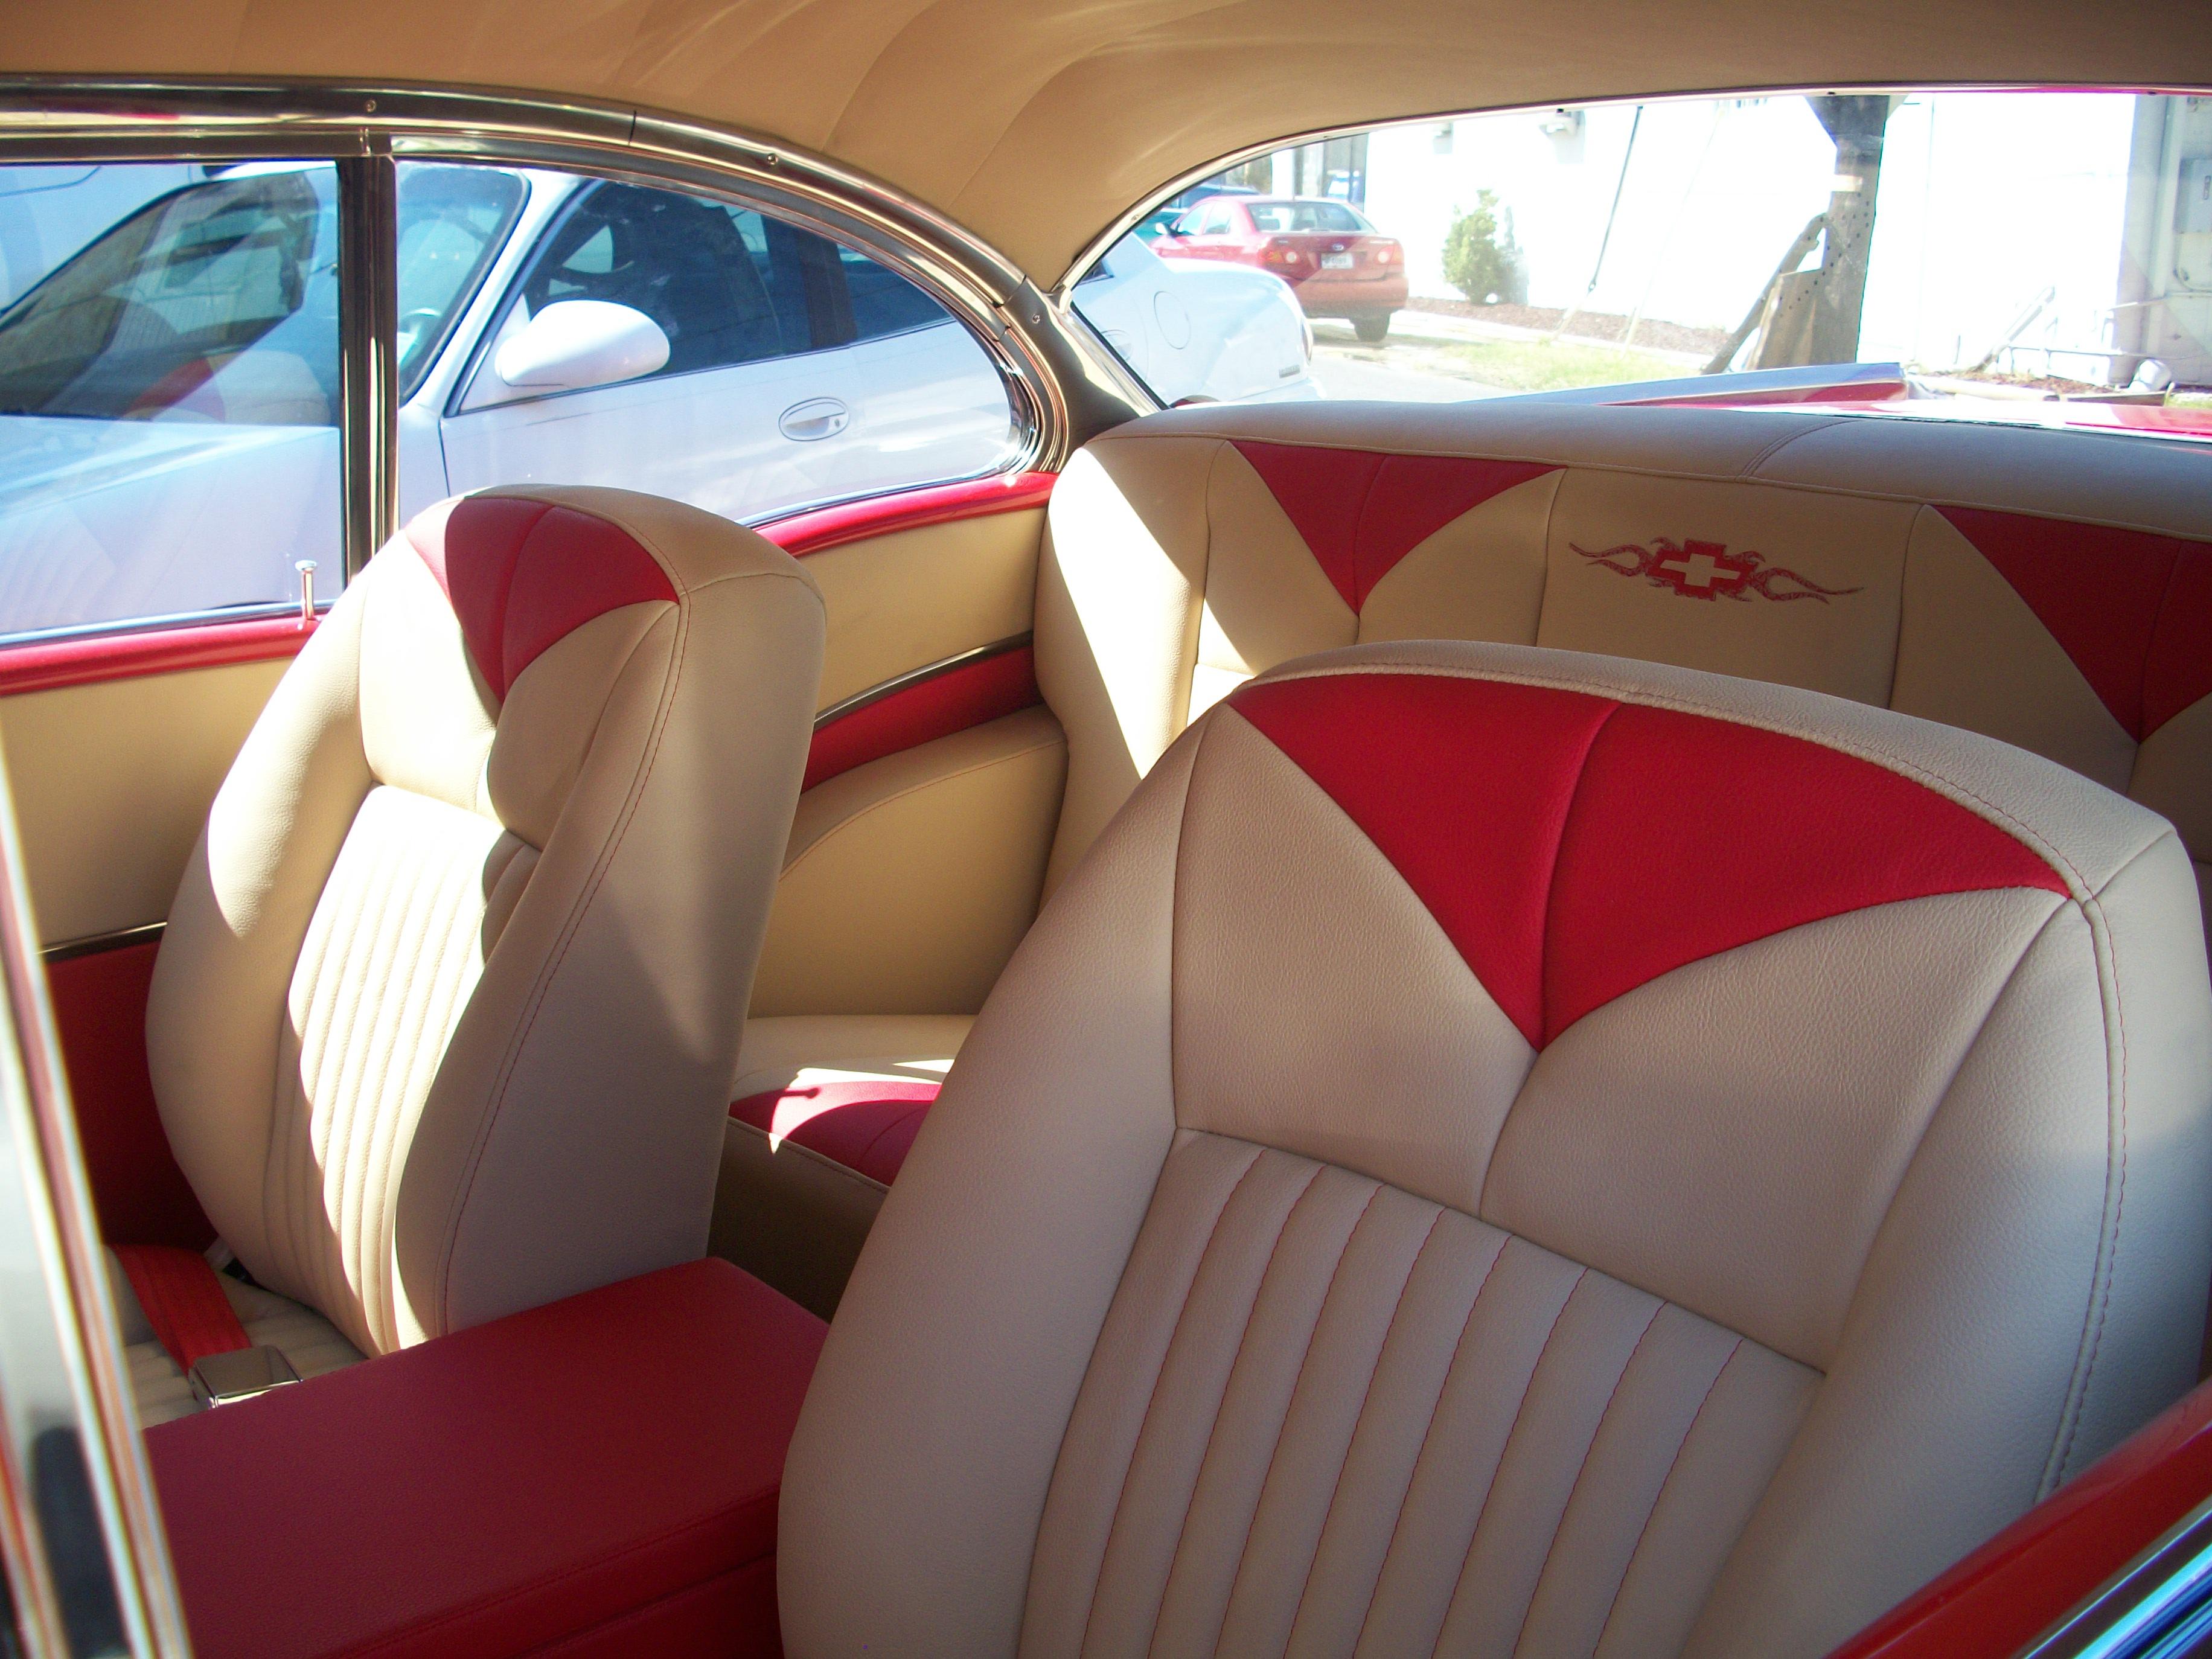 Auto interior designs custom automobile interiors for Auto interior designs